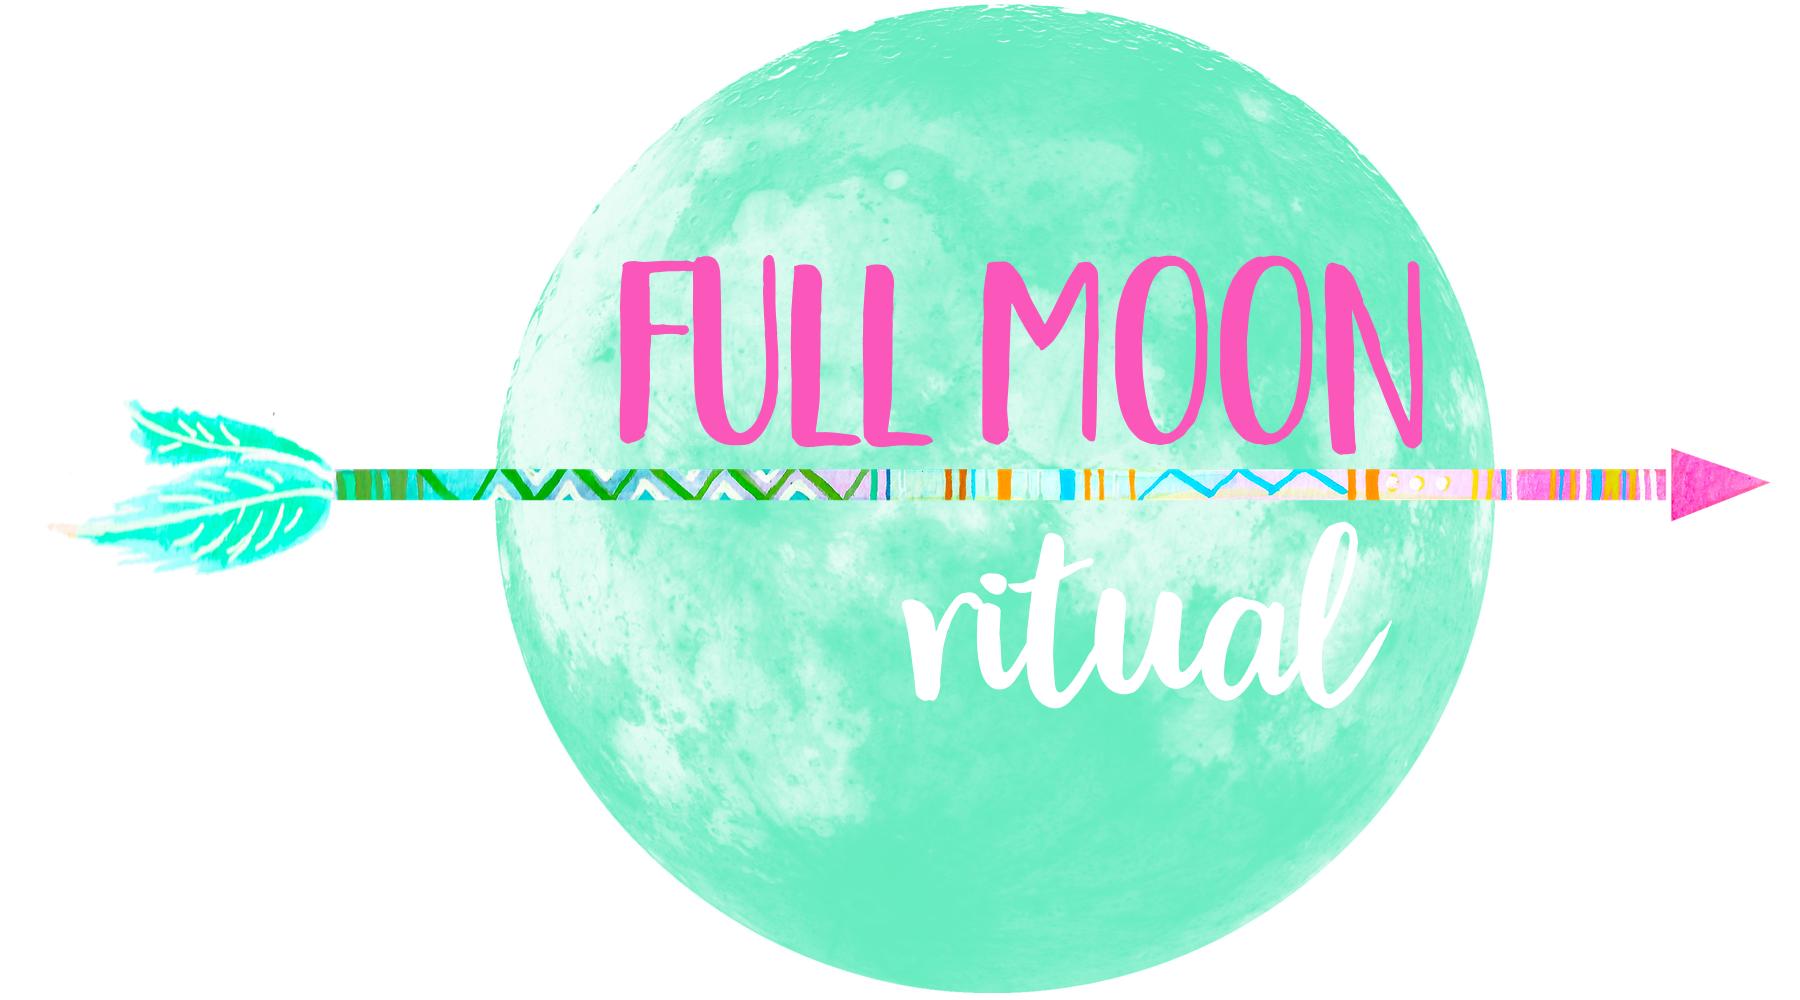 full moon yoga - self-care, yoga pose, positive affirmation, breathing technique